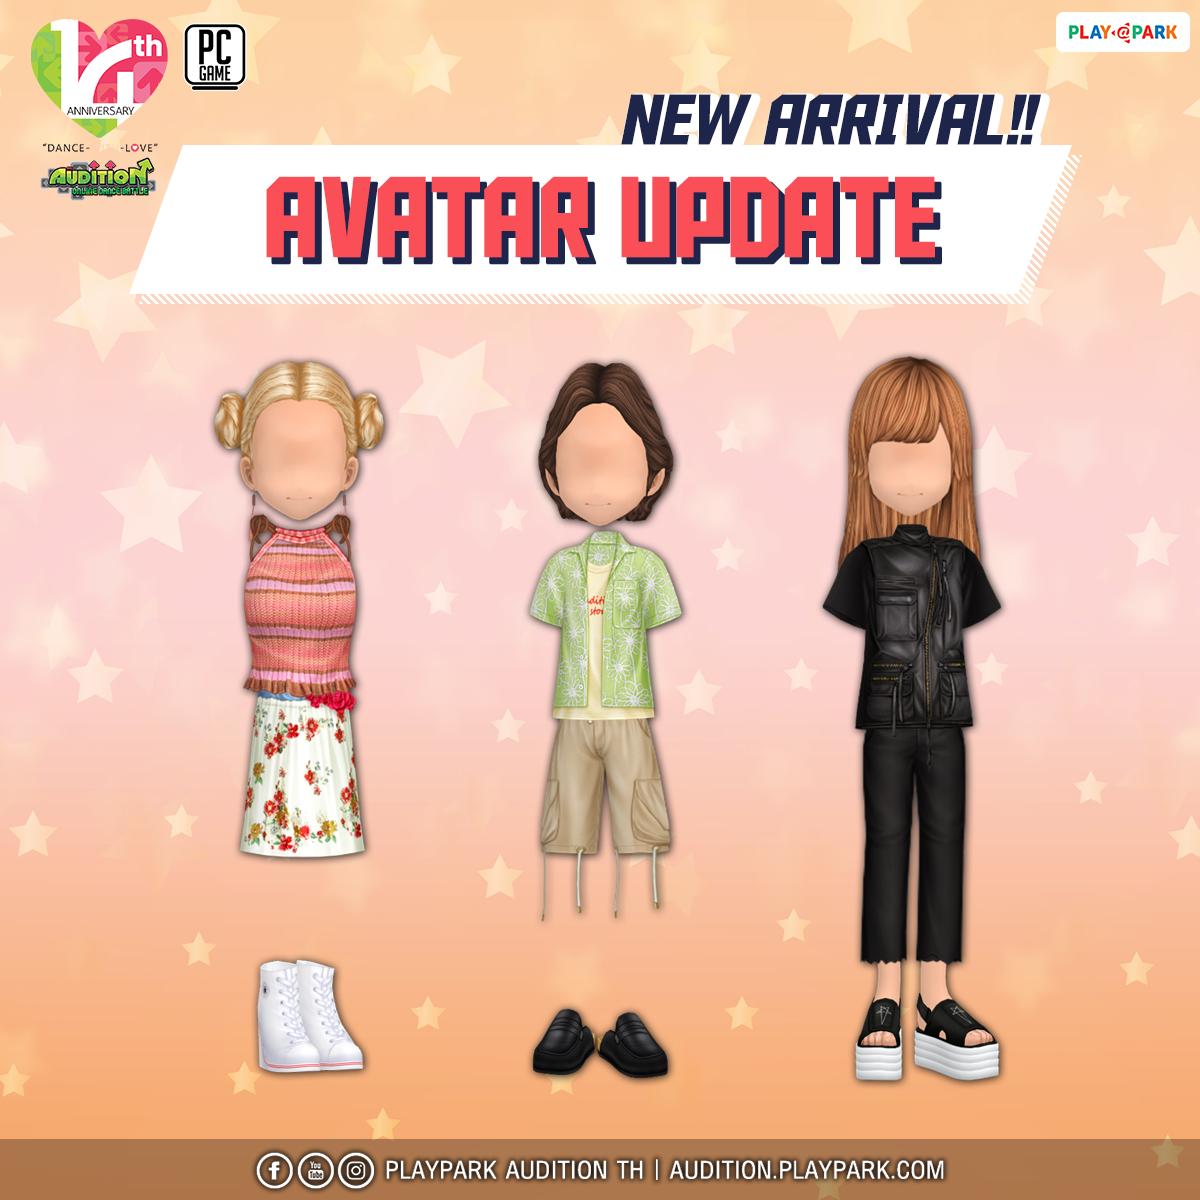 [AUDITION14th] 16 กันยายนนี้ อัปเดตเพลงใหม่, Special Avatar และไอเทมใหม่ !!